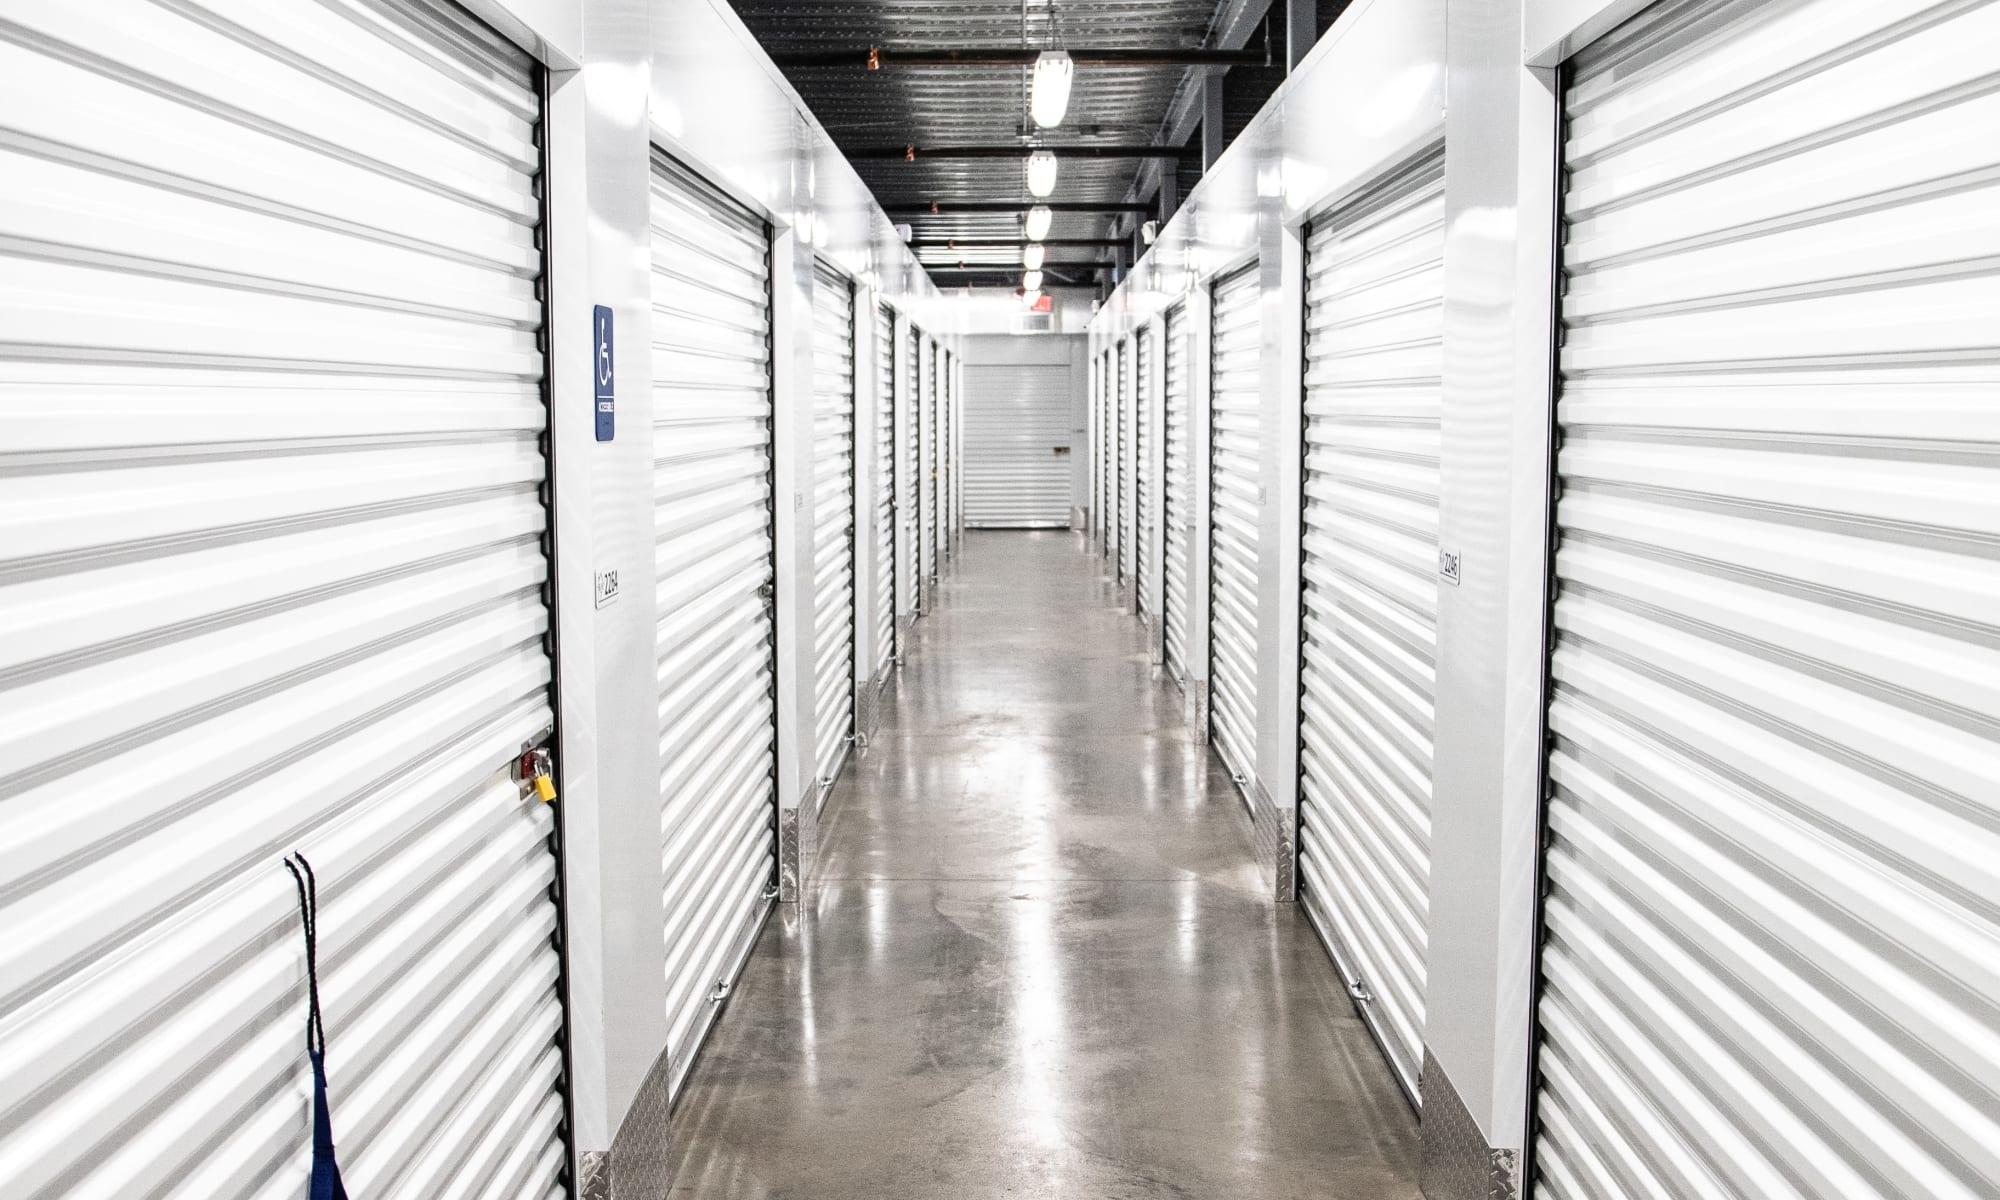 Indoor access hallway for storage units